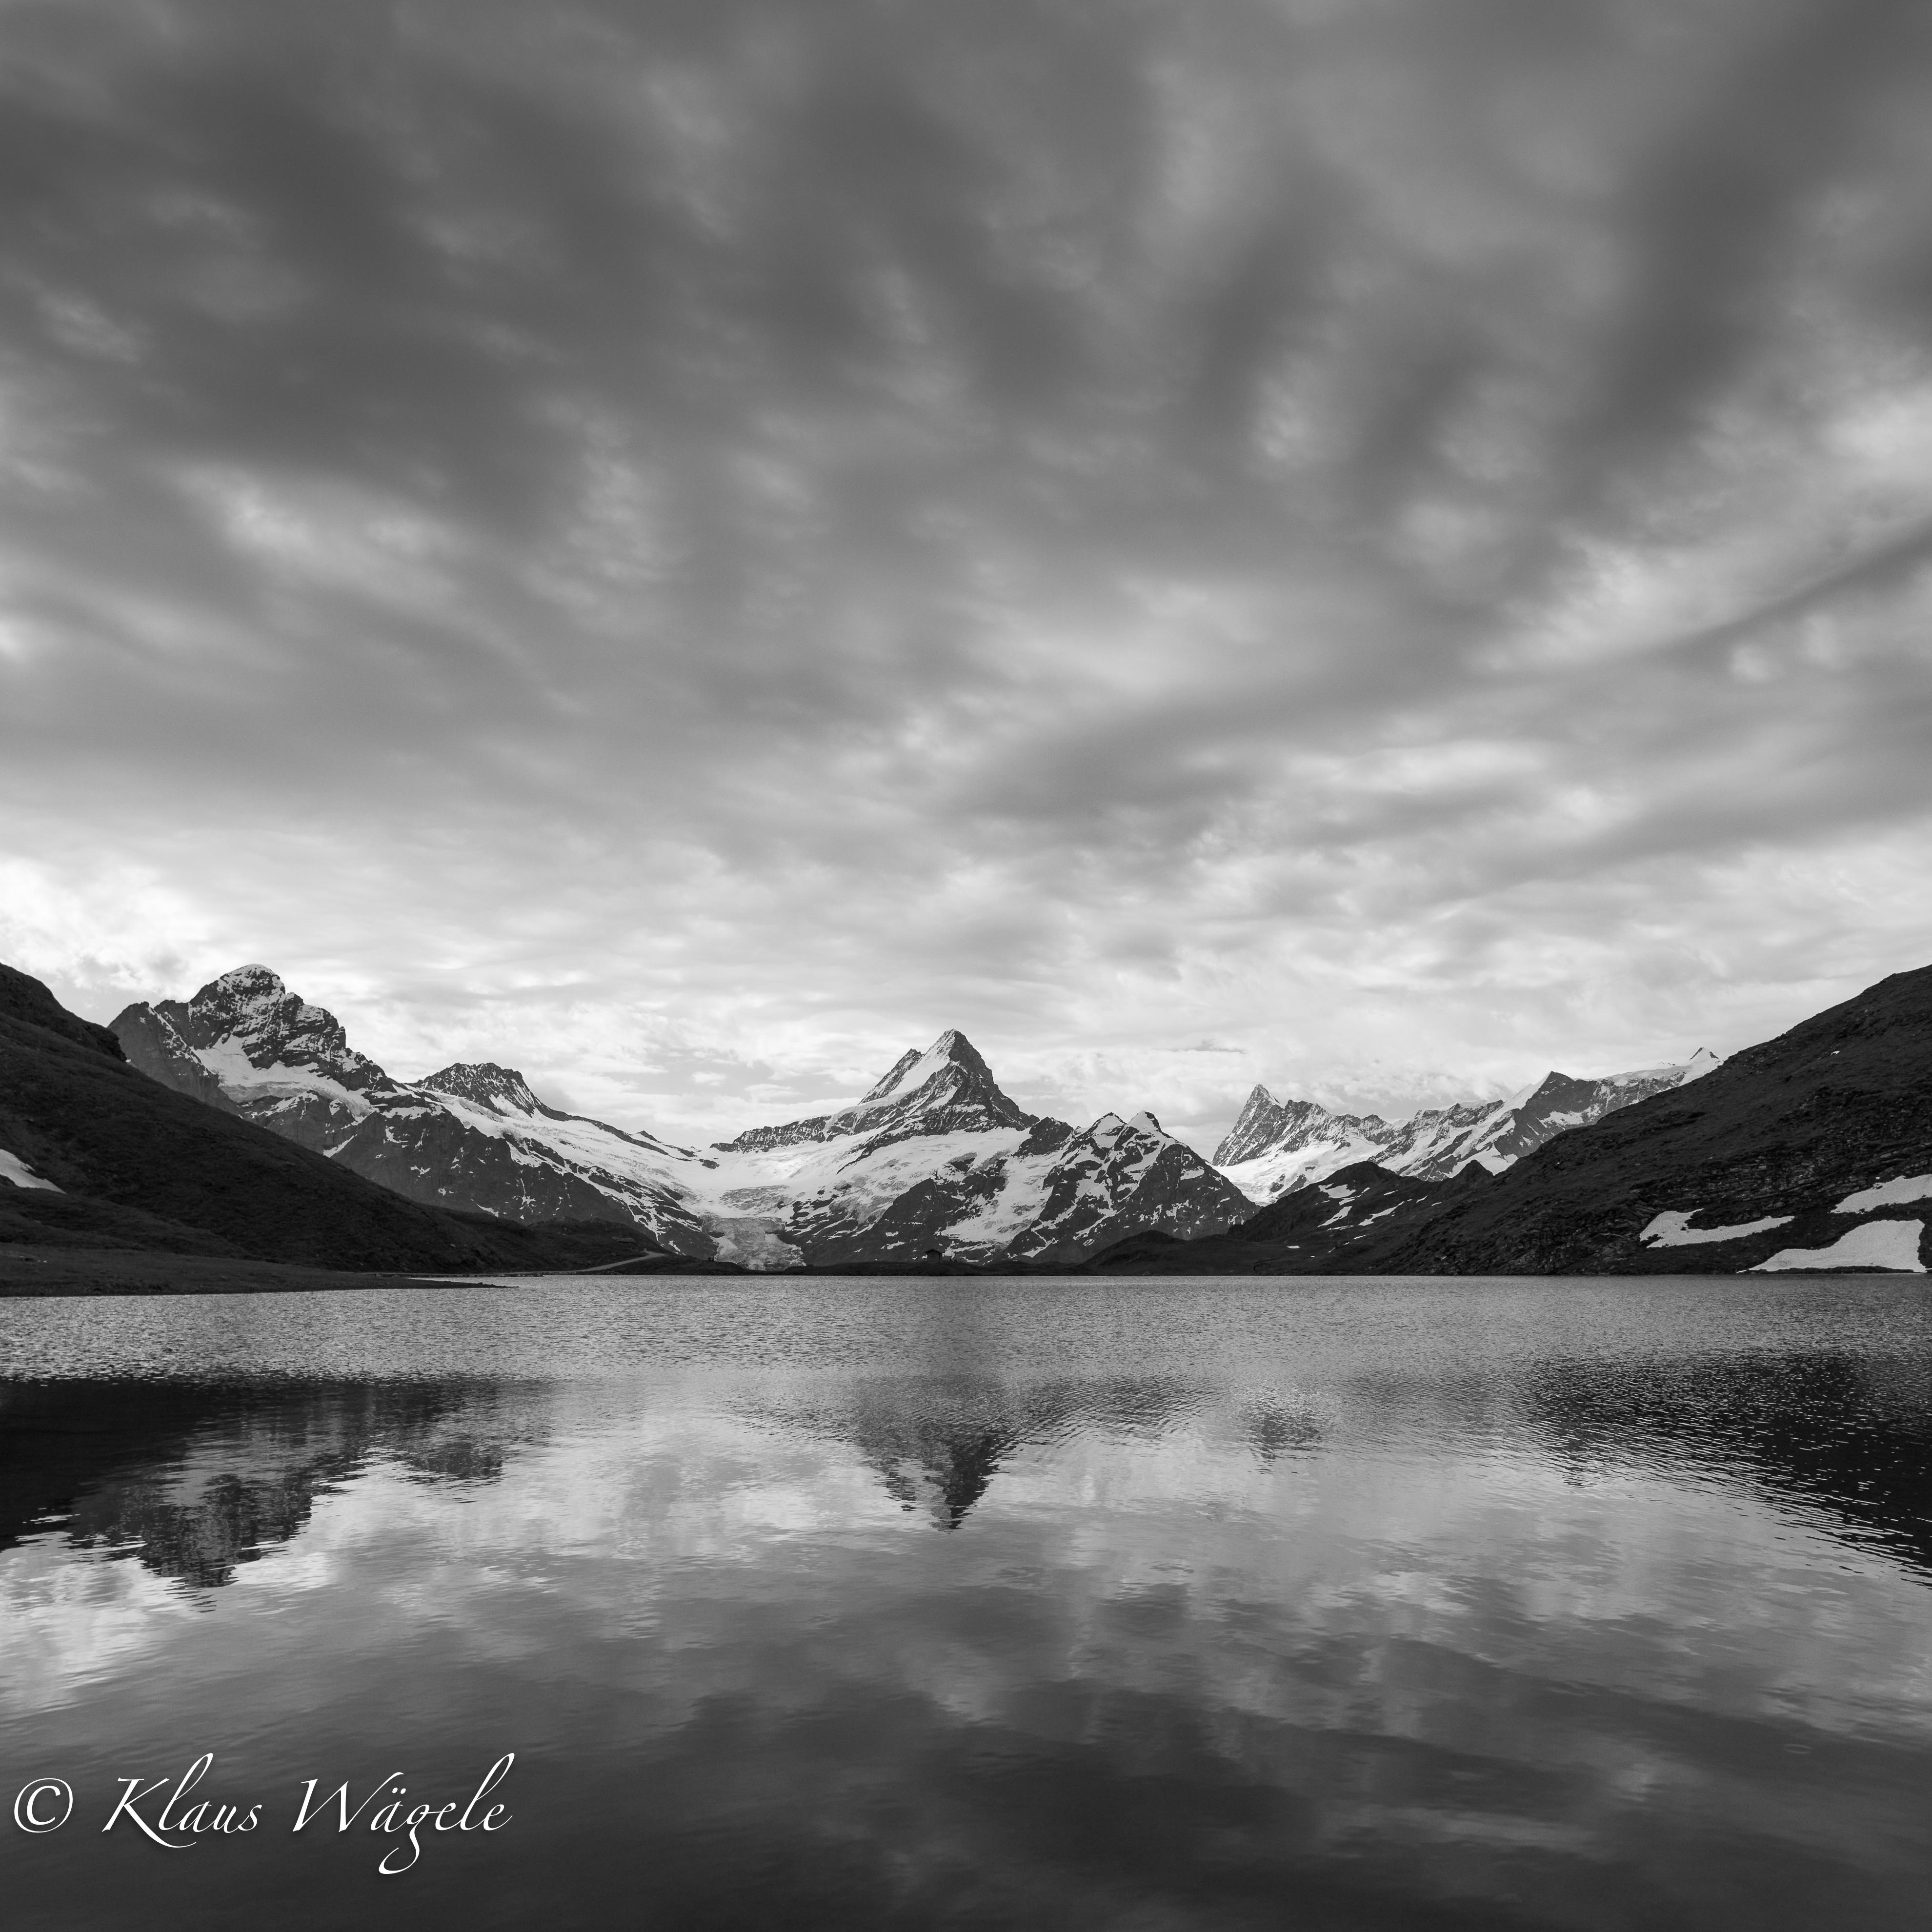 Bachalpsee (Grindelwald)